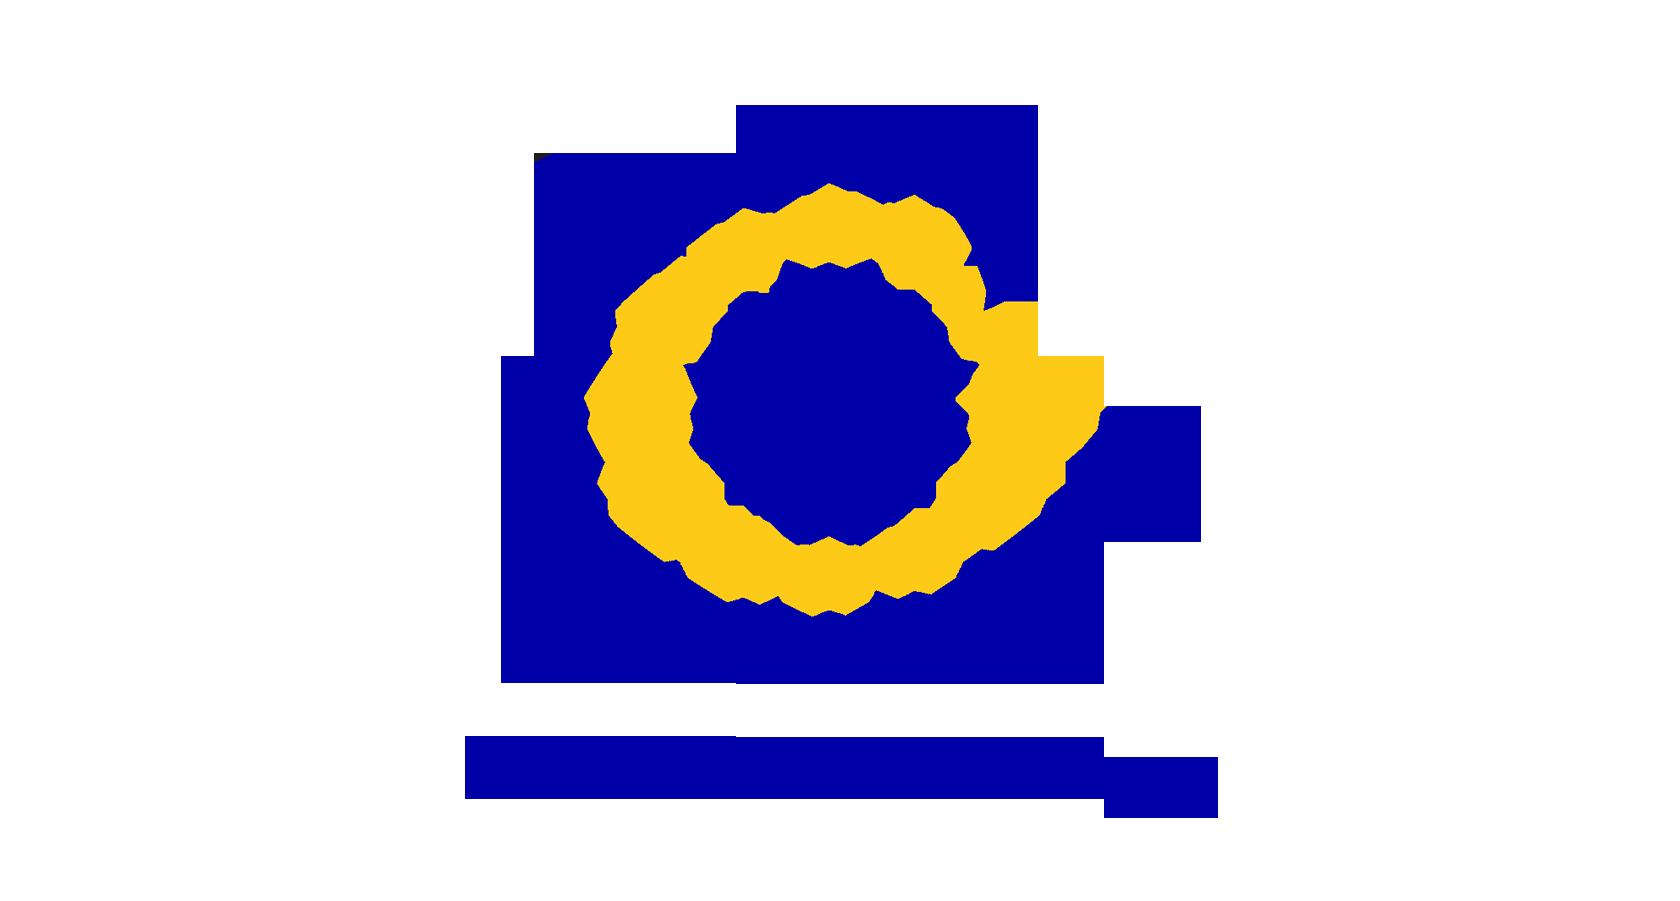 Онлайн курс ЕСПЧ-Навигатор